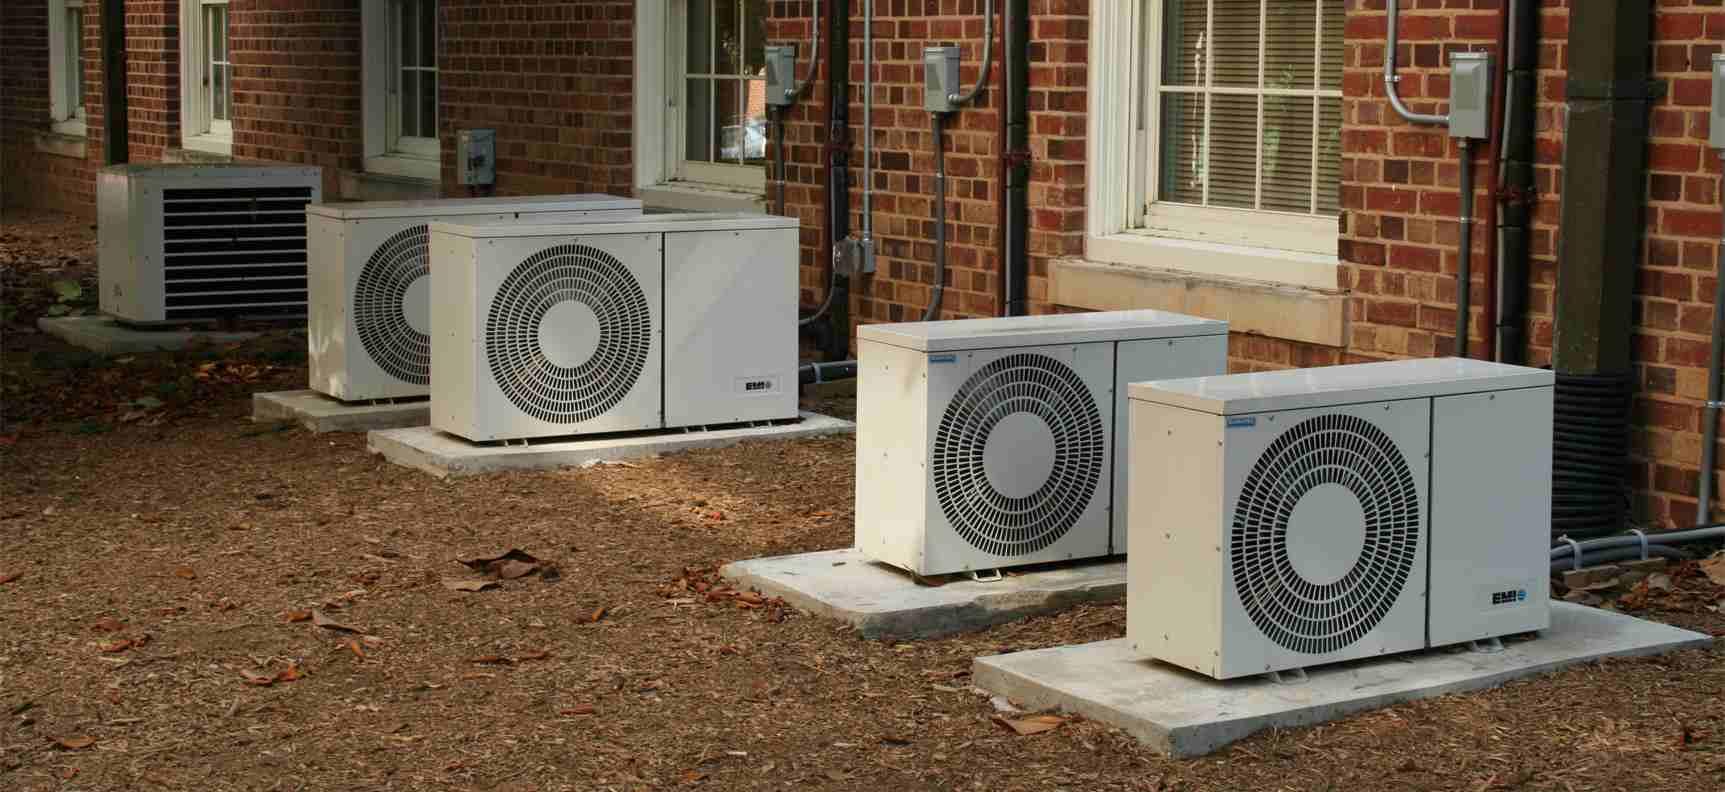 Beginner's knowledge of HVAC